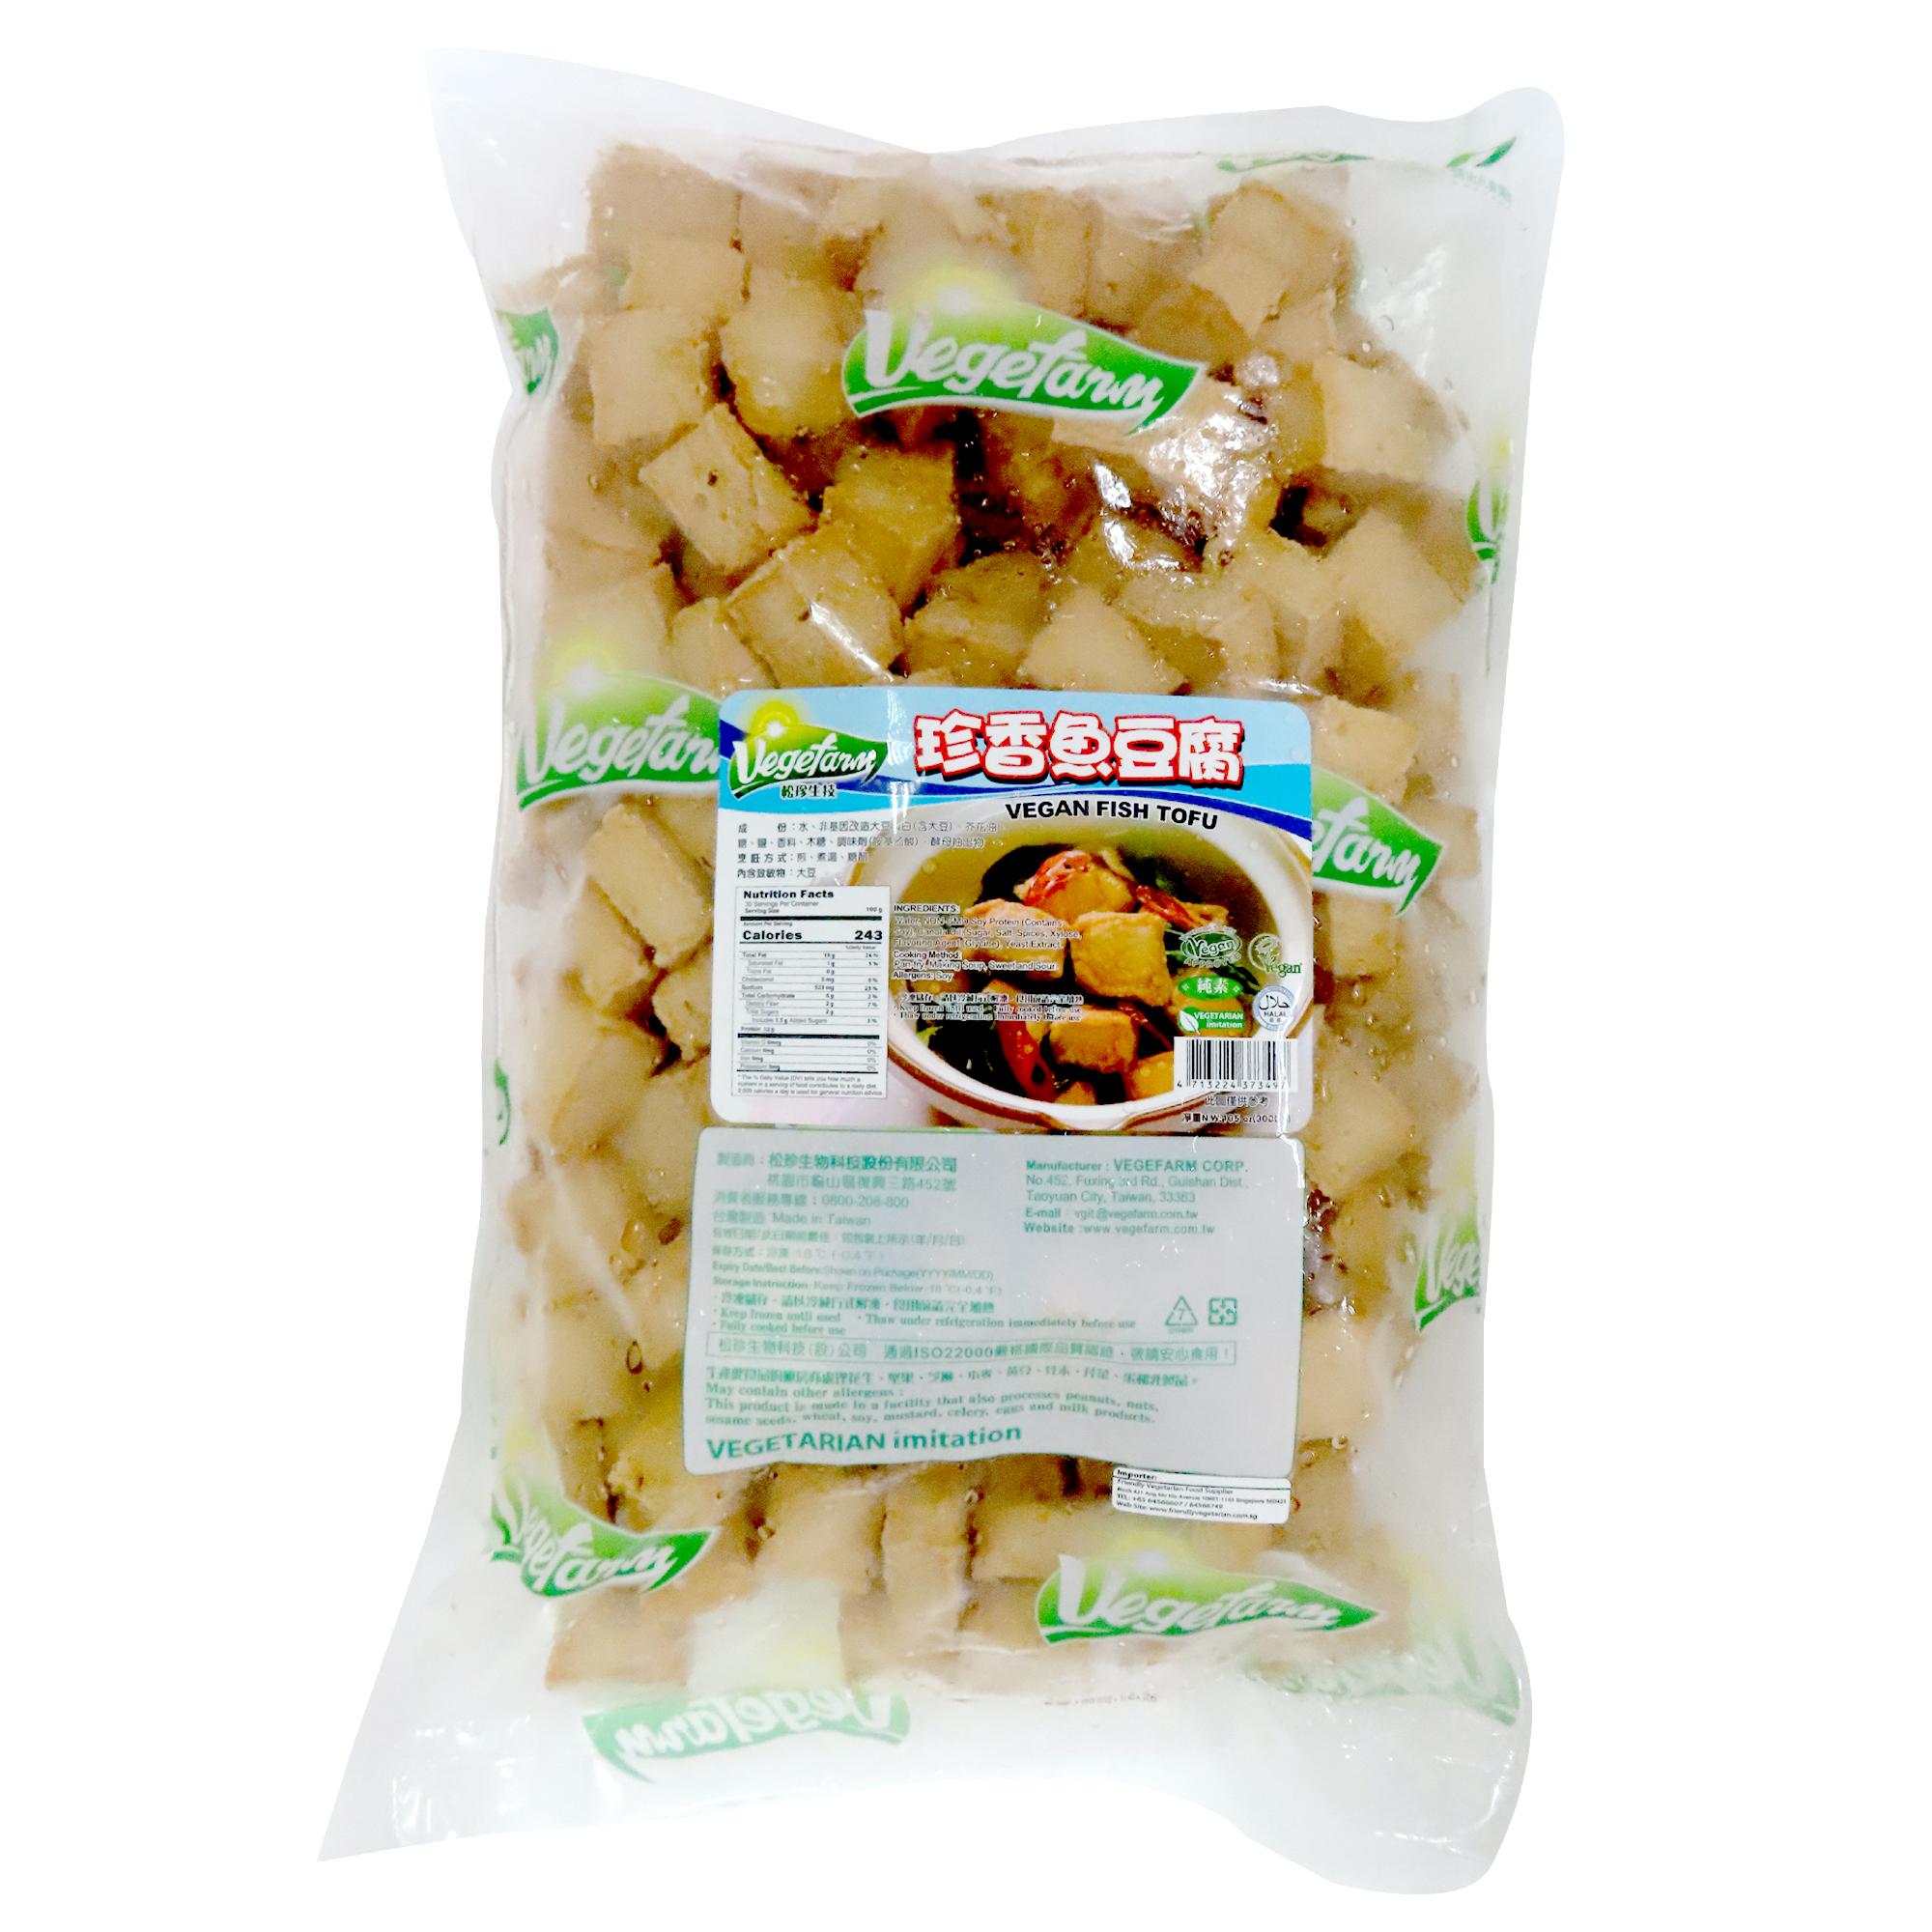 Image SZ Fish Tofu 松珍 - 鱼豆腐(纯素)3000grams